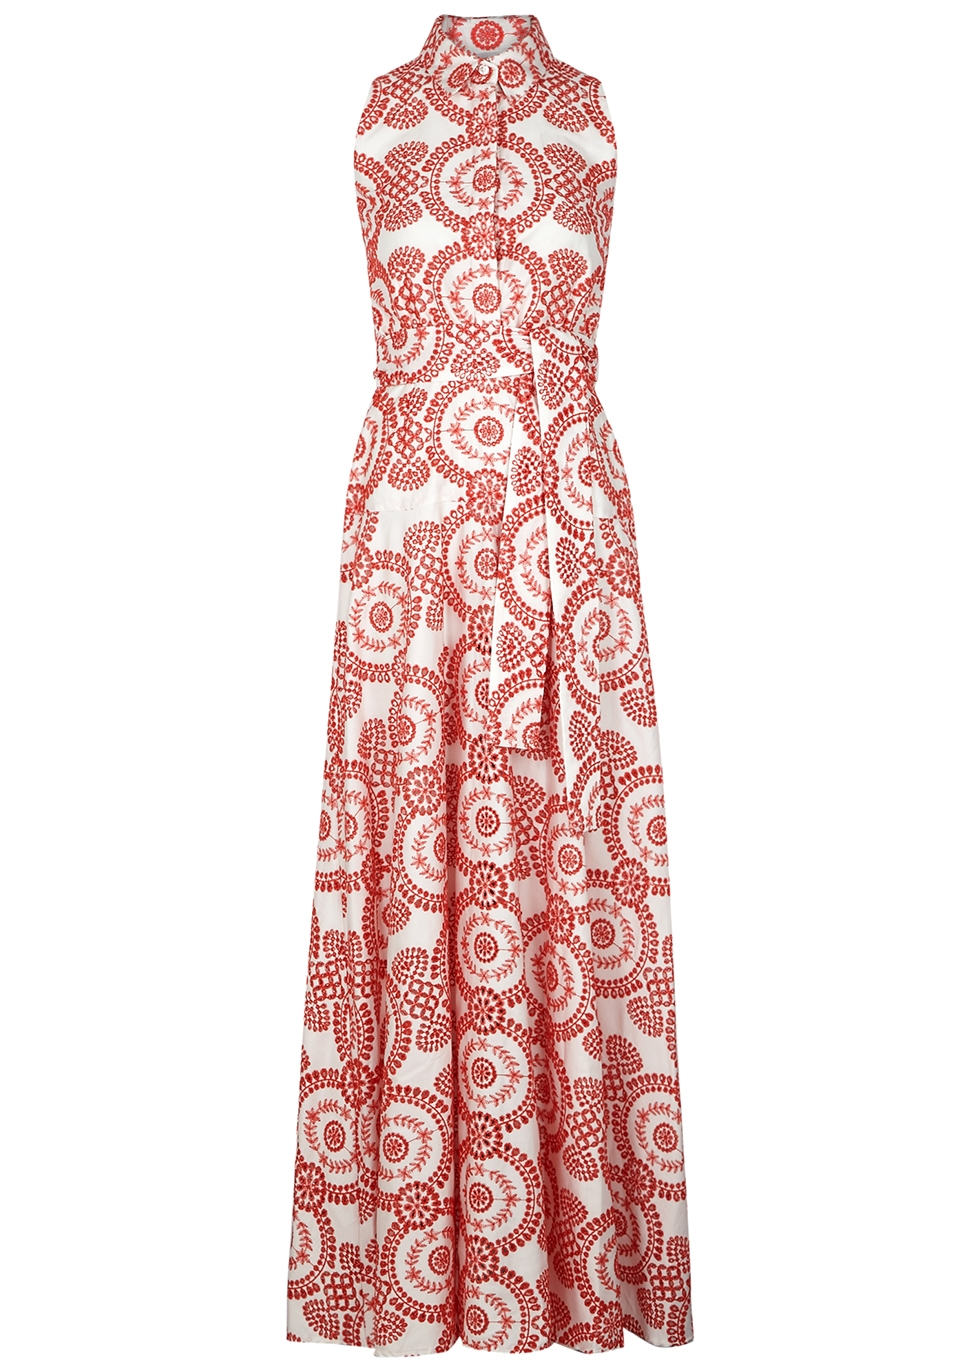 Paloma eyelet-embroidered maxi dress